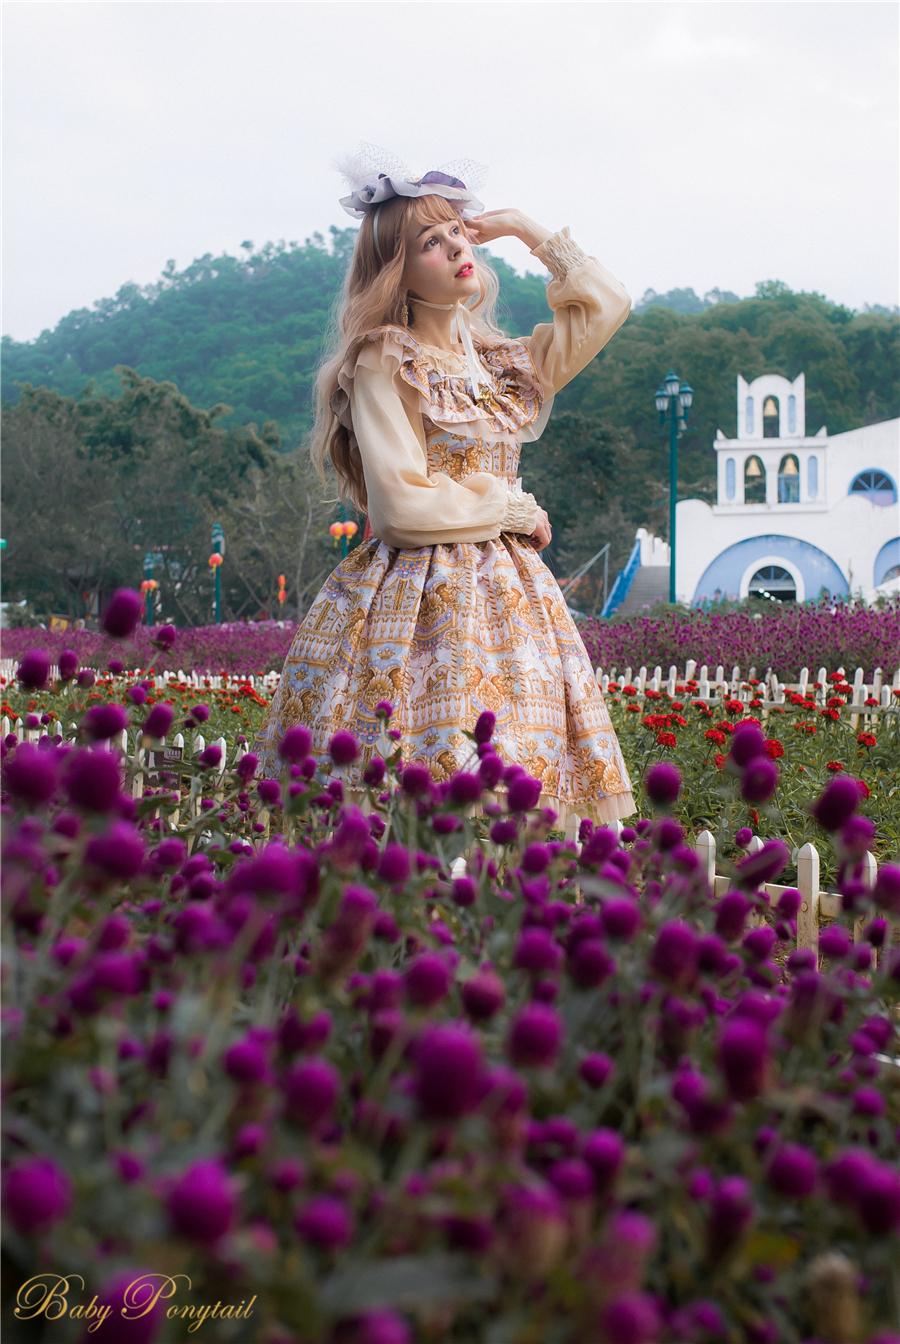 Babyponytail_Model_JSK_Purple Present Angel_Claudia_02.jpg